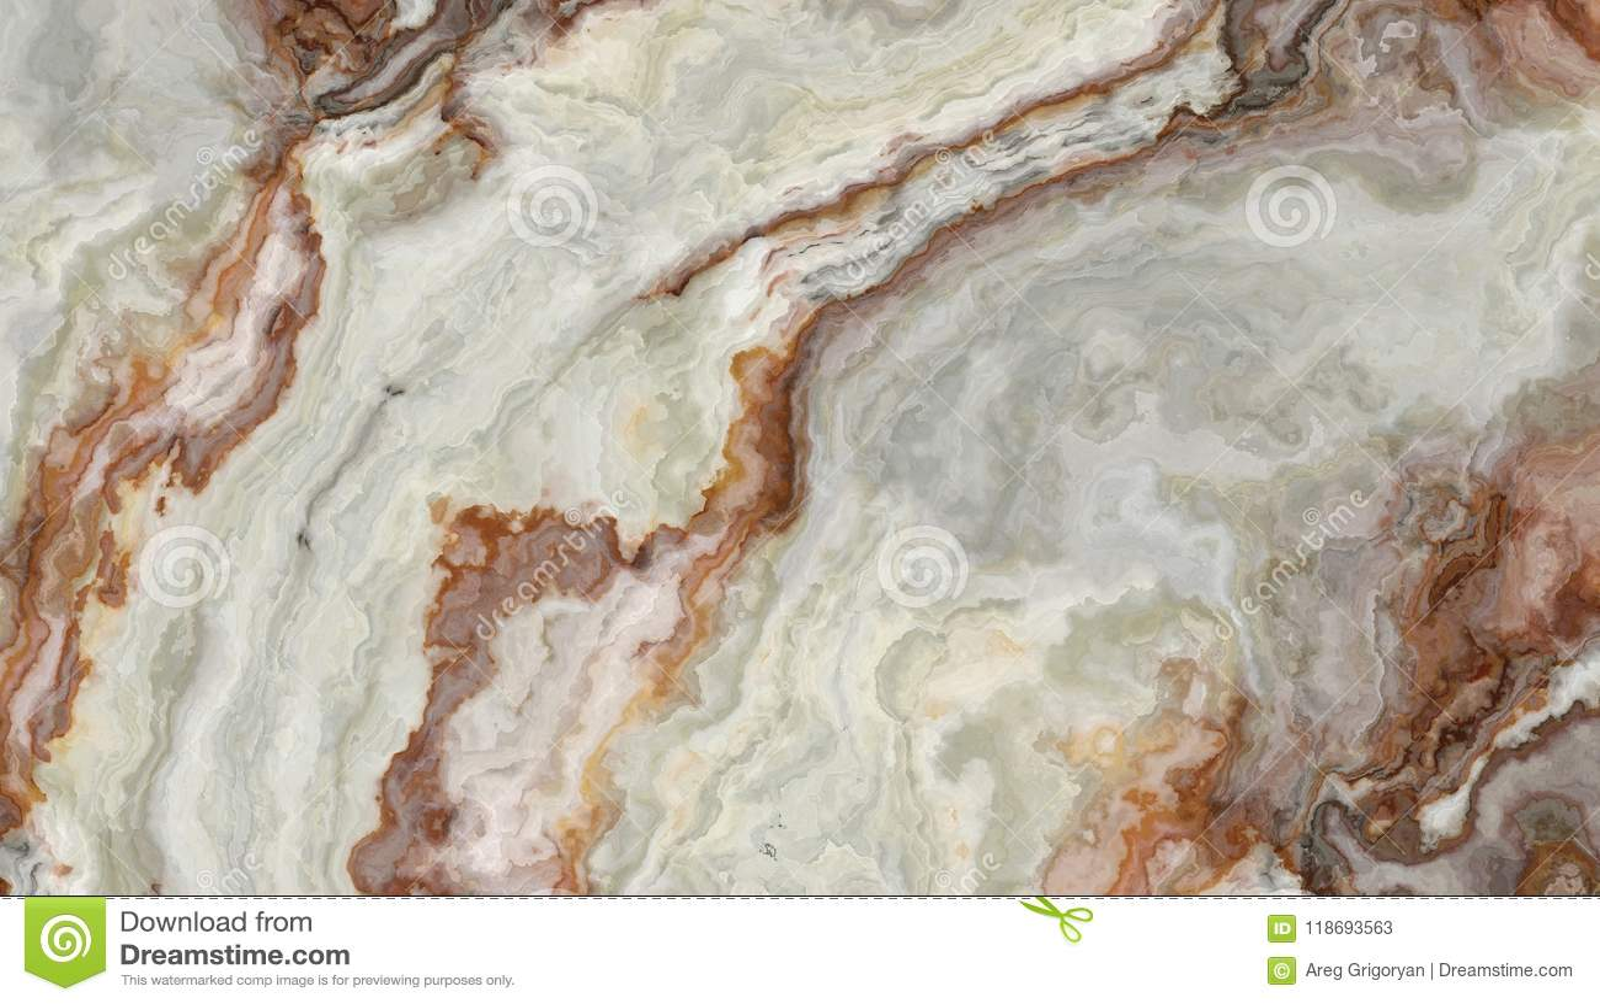 Onyx Tile texture stock image. Image of bathroom, beige - 118693563